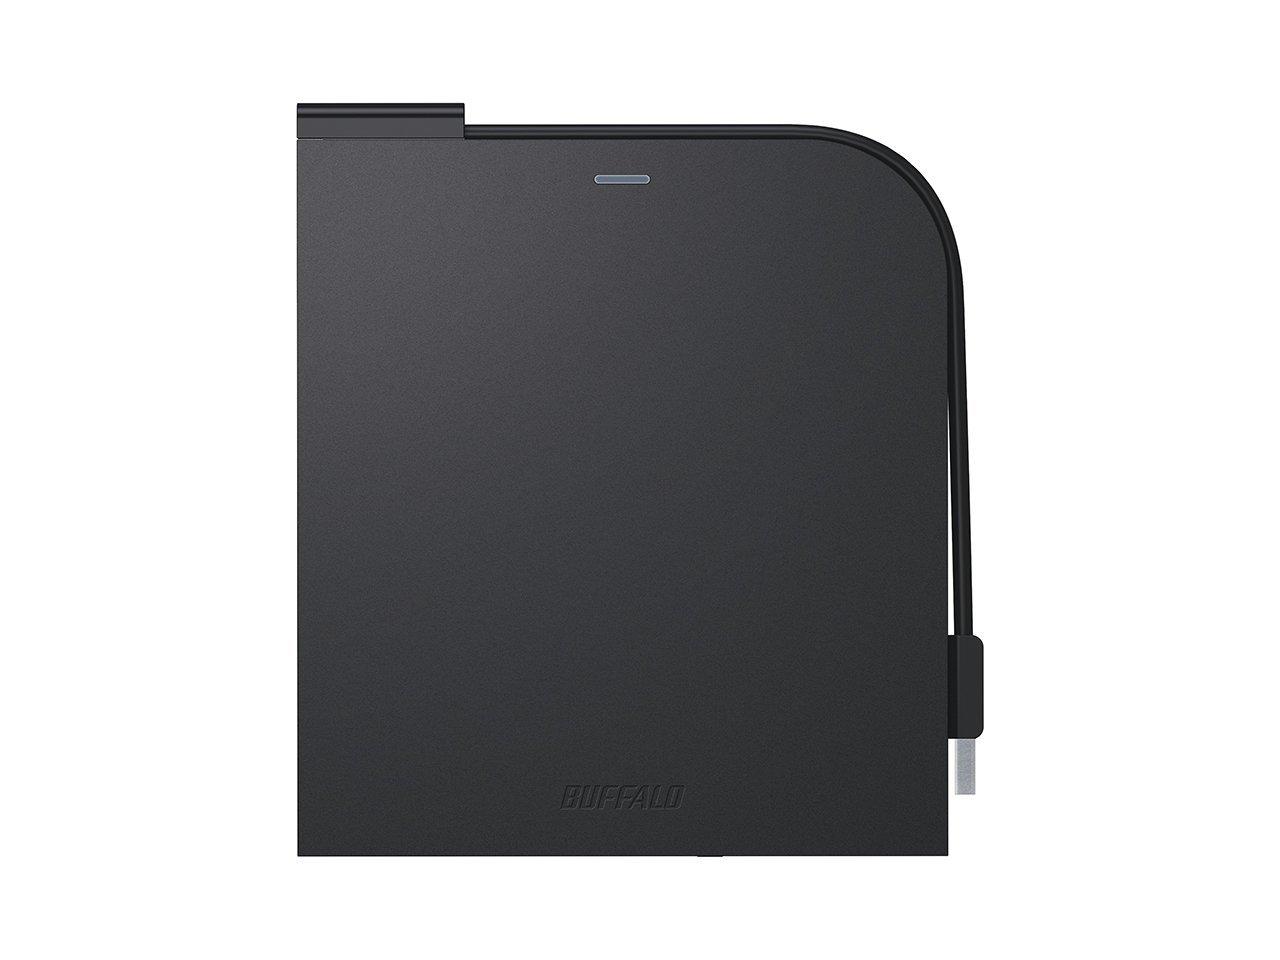 BUFFALO DVD & Blu-Ray XL Writer diskdzinis, optiskā iekārta